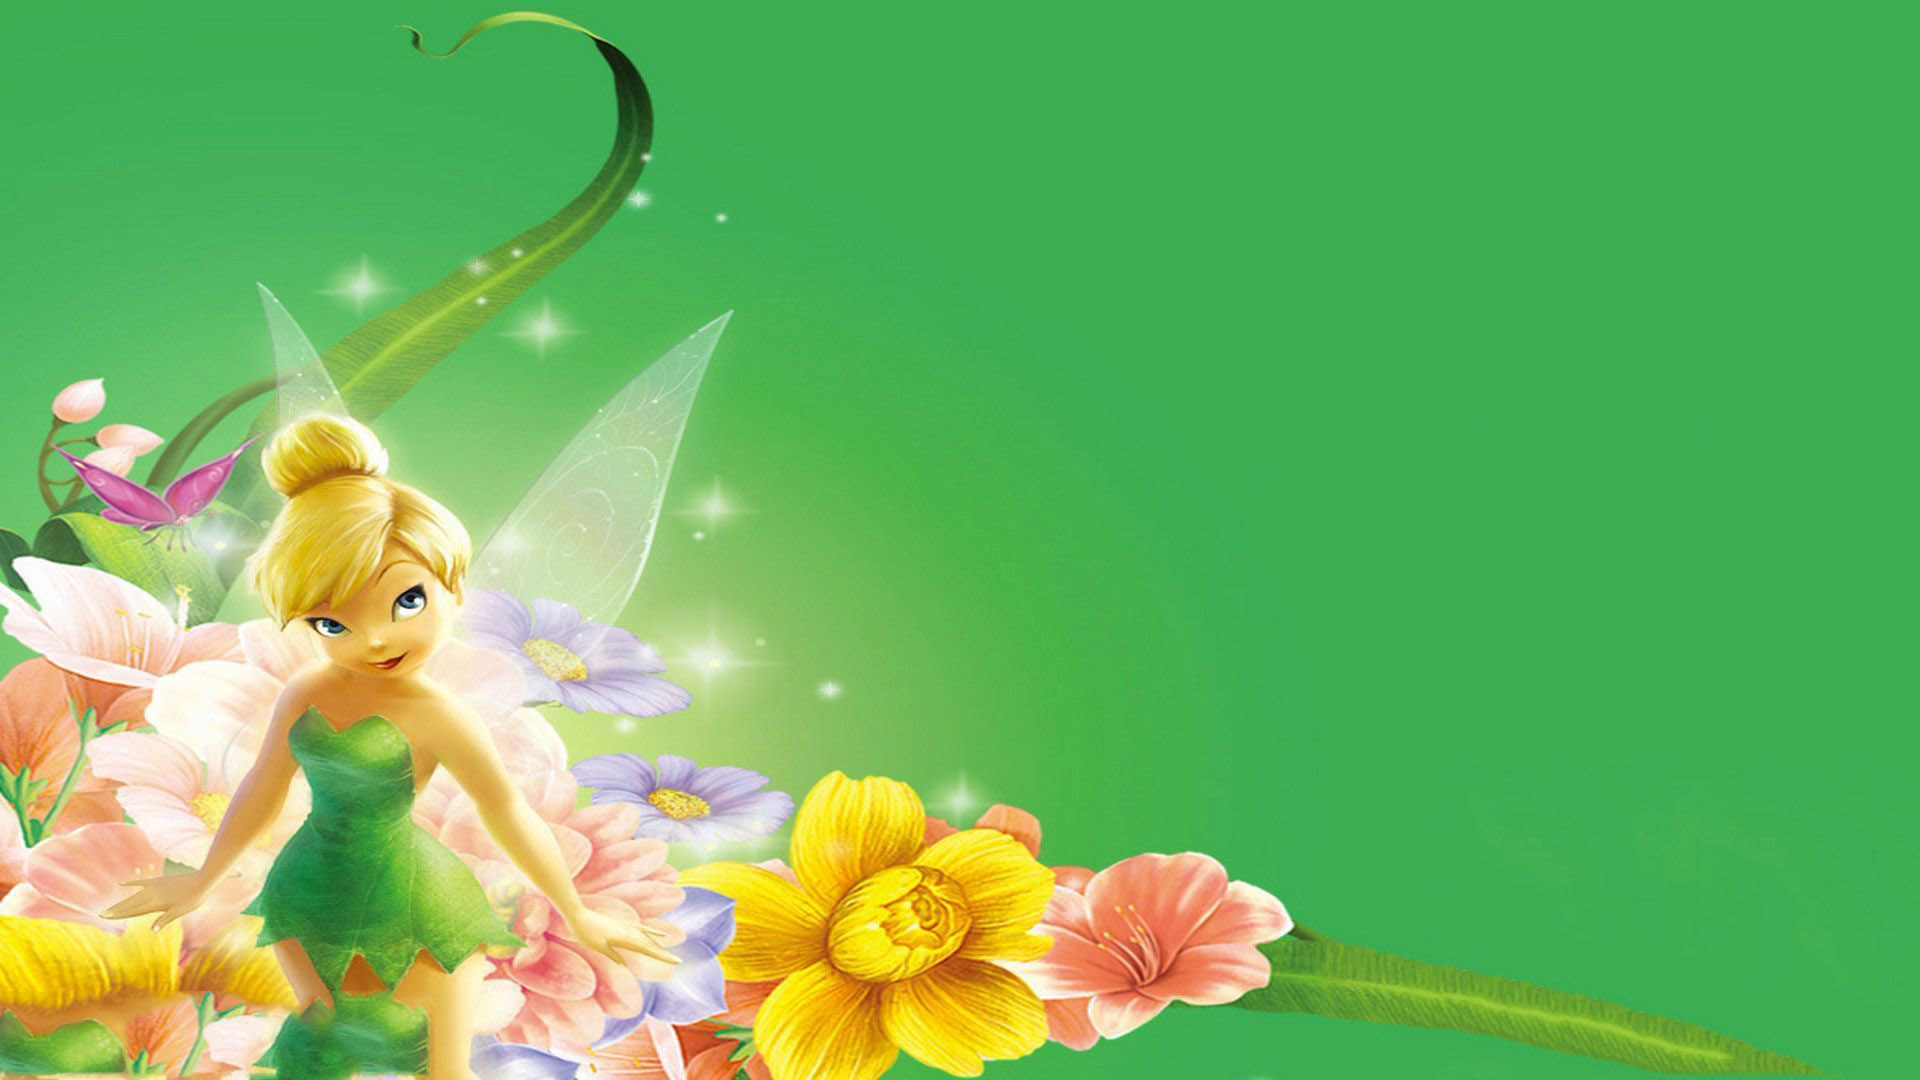 Tinker bell movie hd desktop wallpaper widescreen mobile 1920x1080 voltagebd Gallery